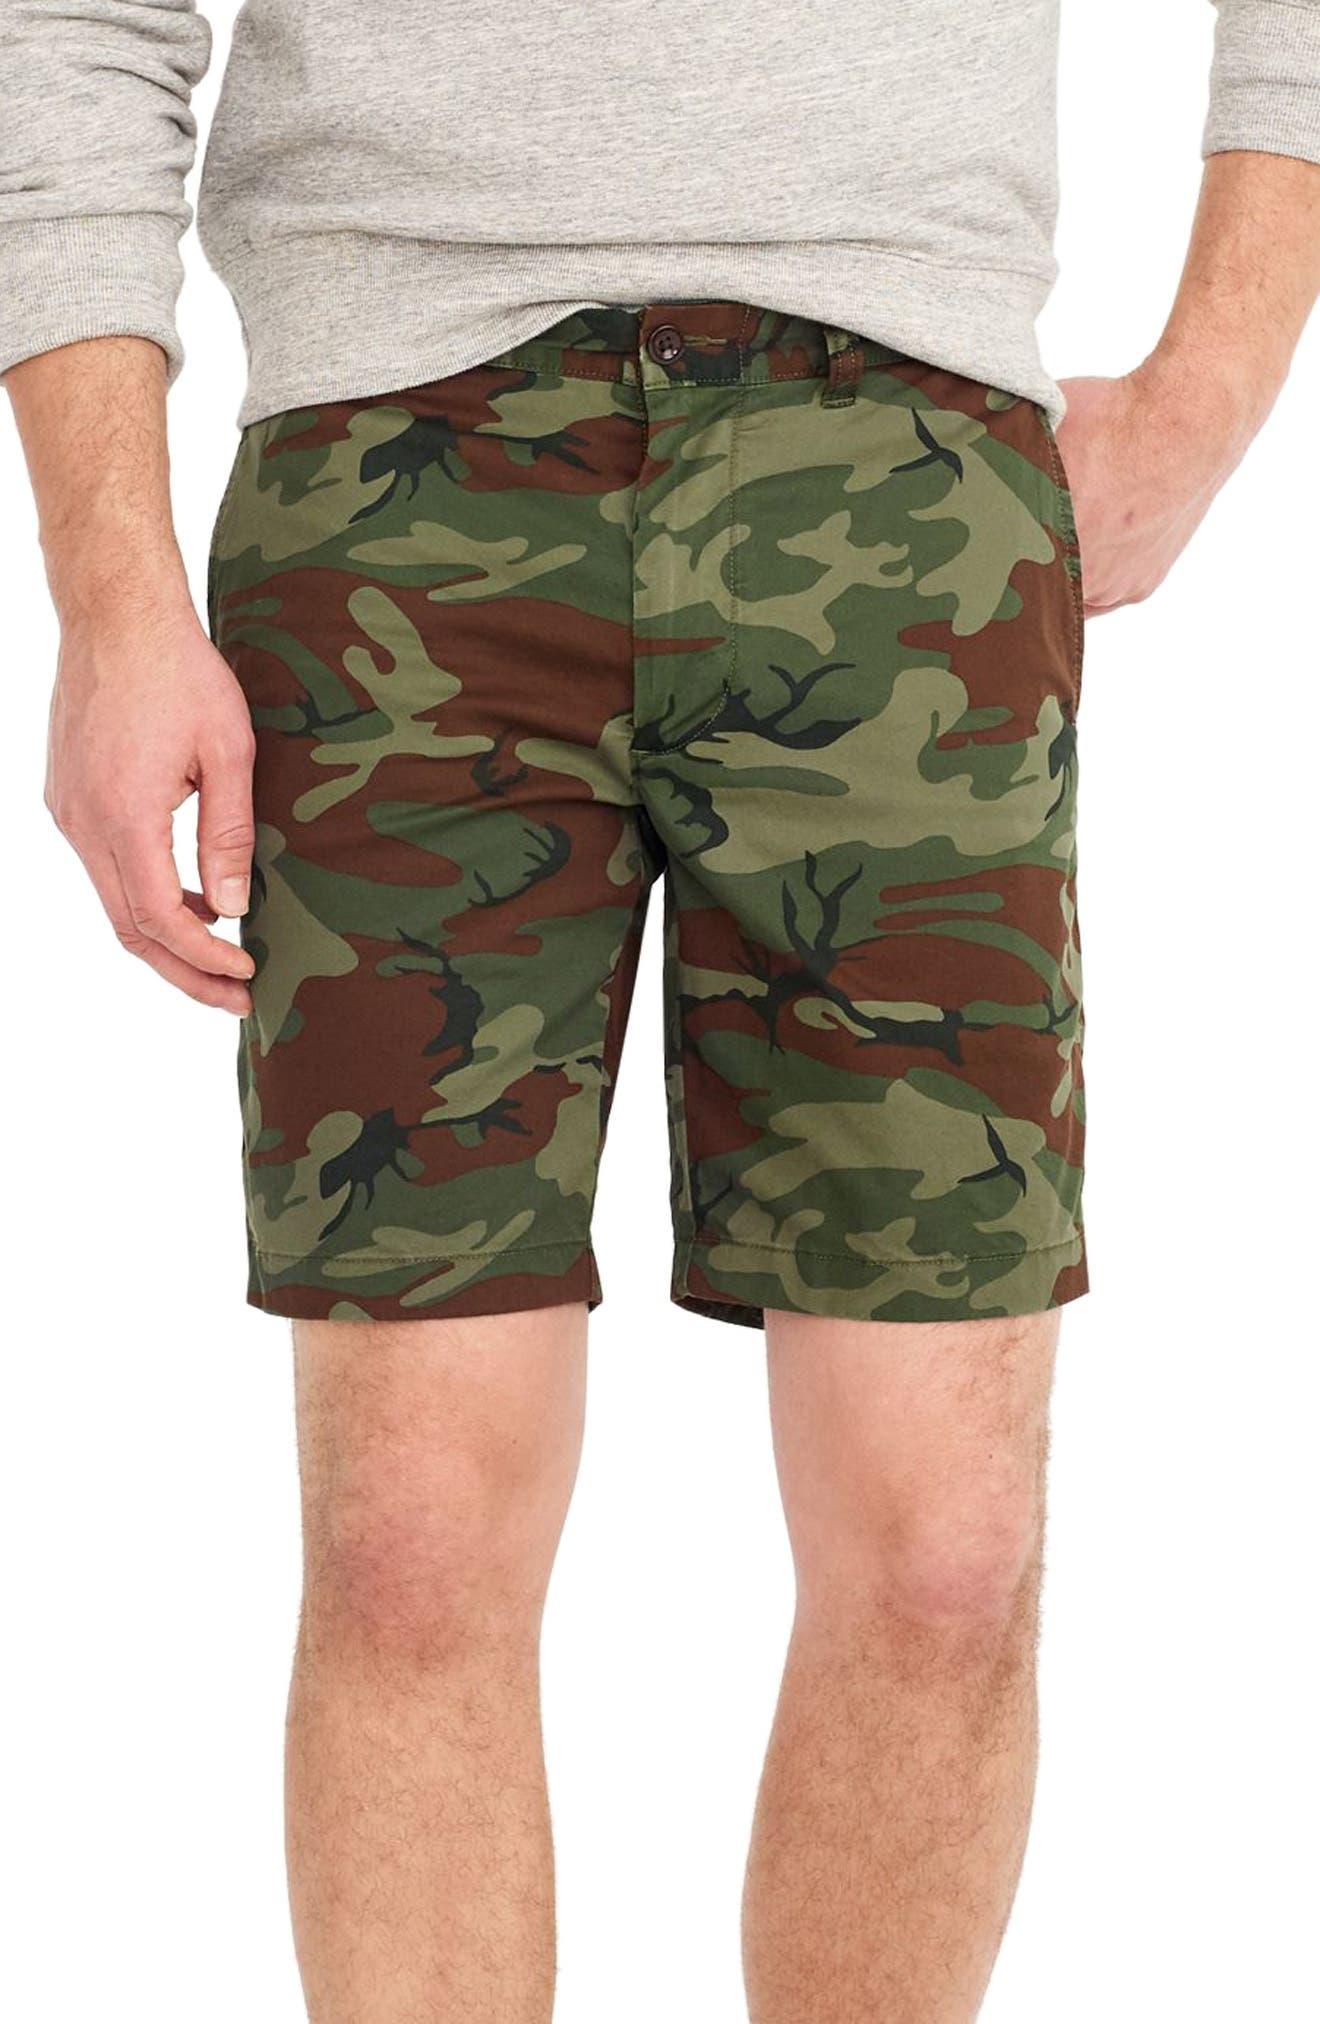 Stretch Camo Shorts,                             Main thumbnail 1, color,                             300